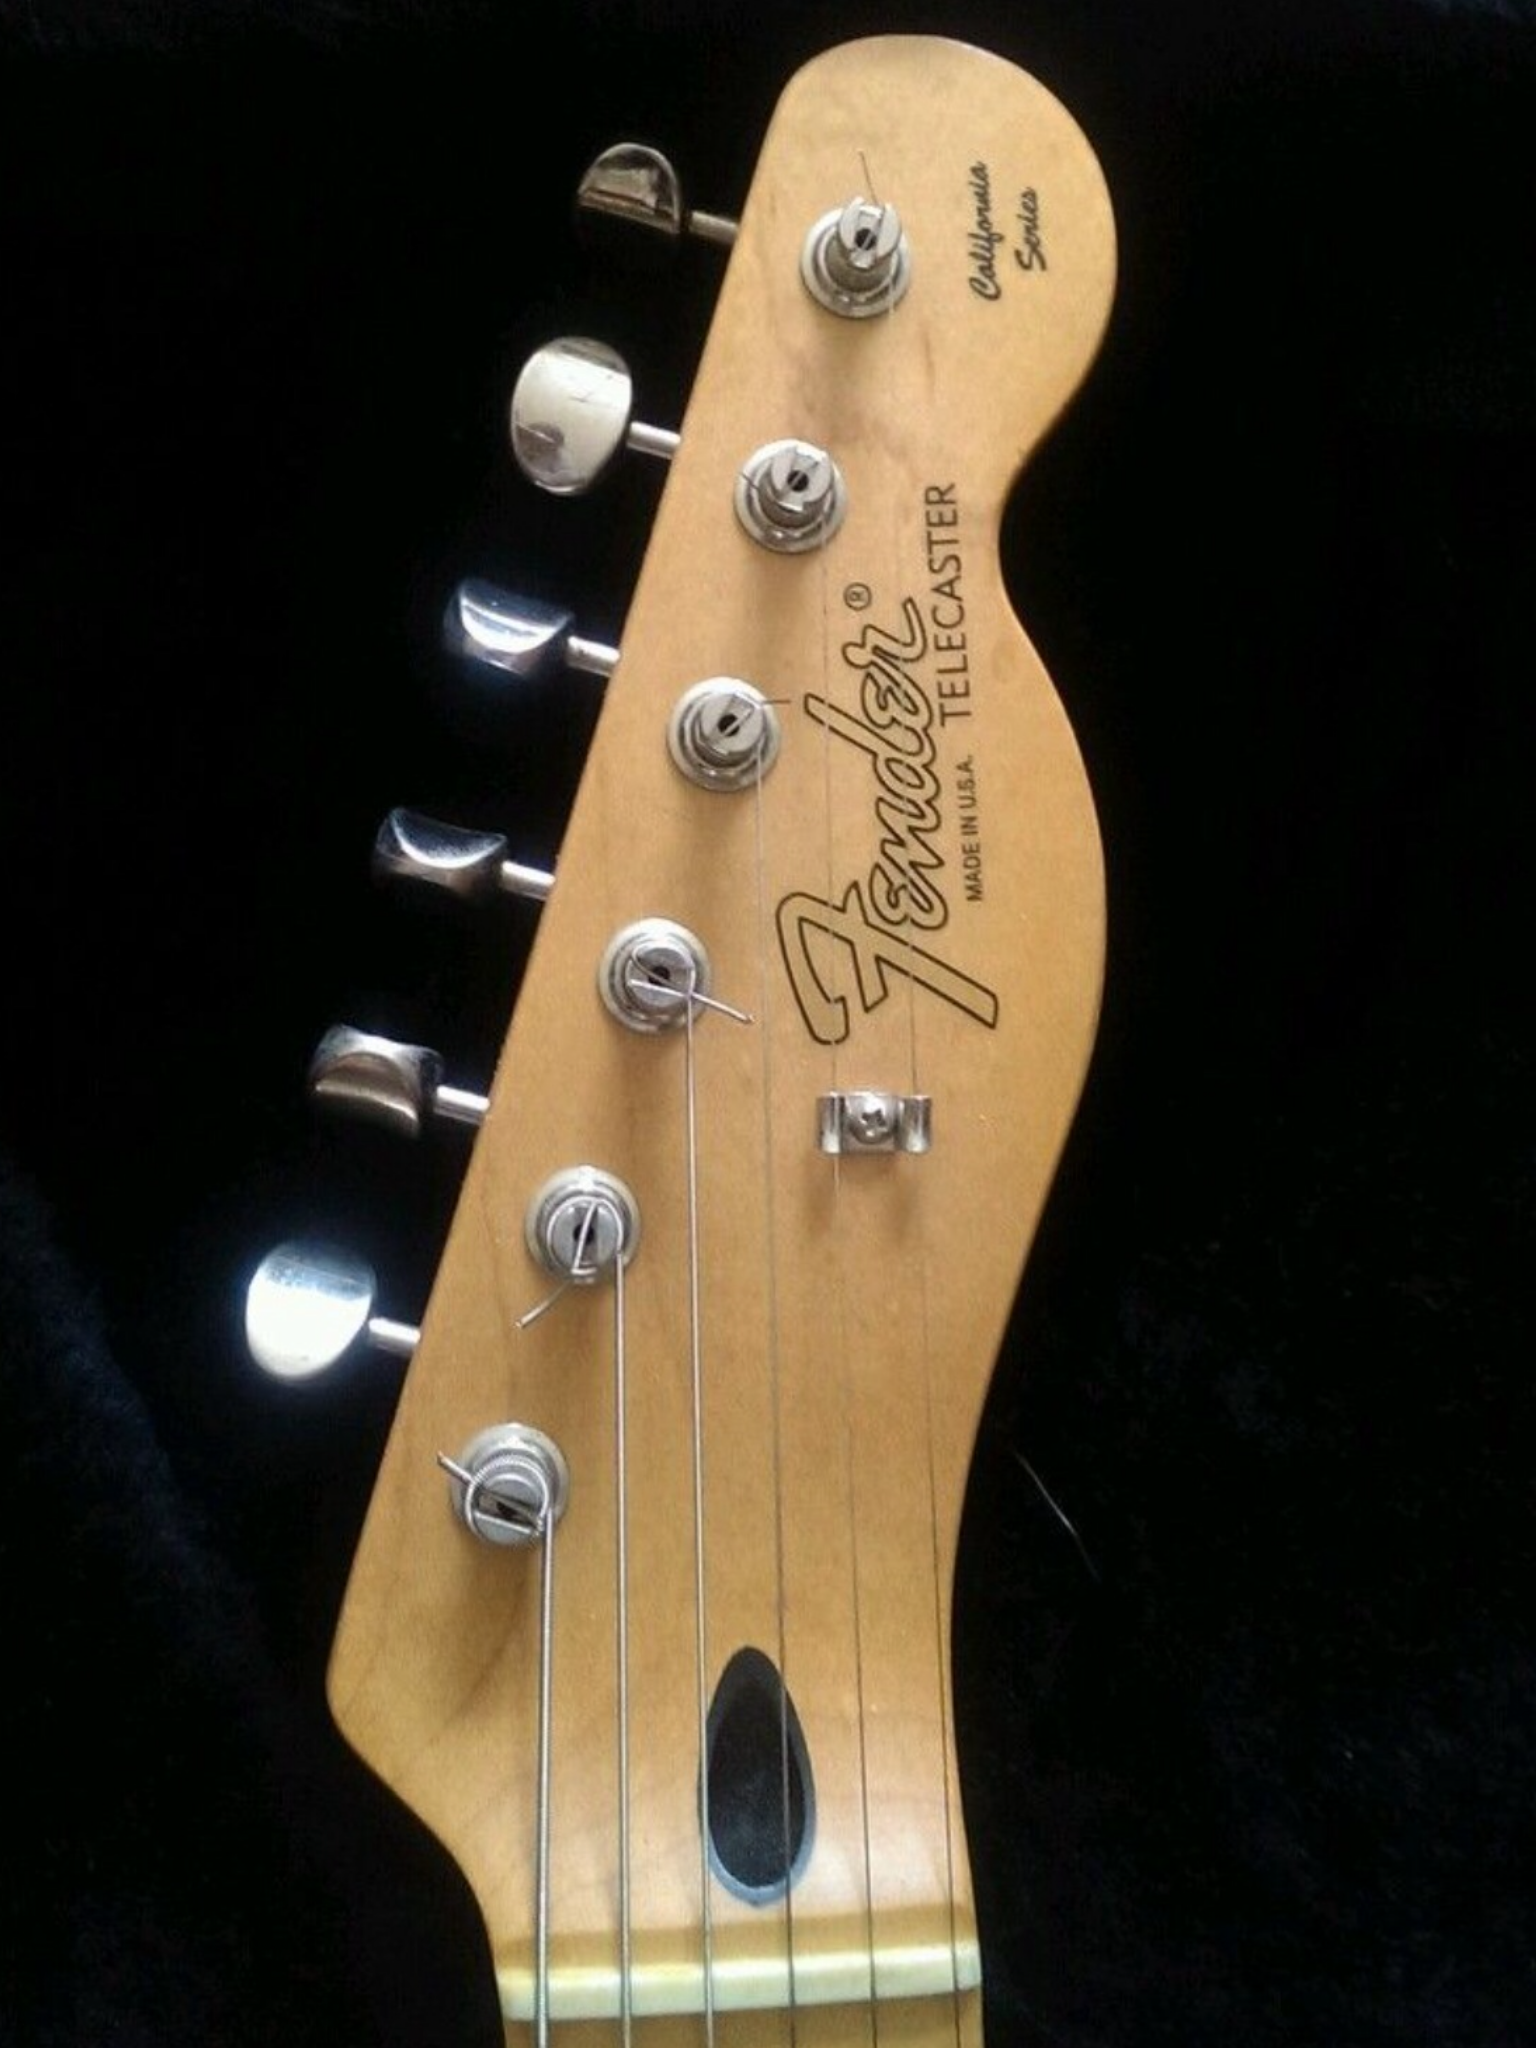 97 98 California Series Telecaster Headstock Fender Guitars Telecaster Guitar